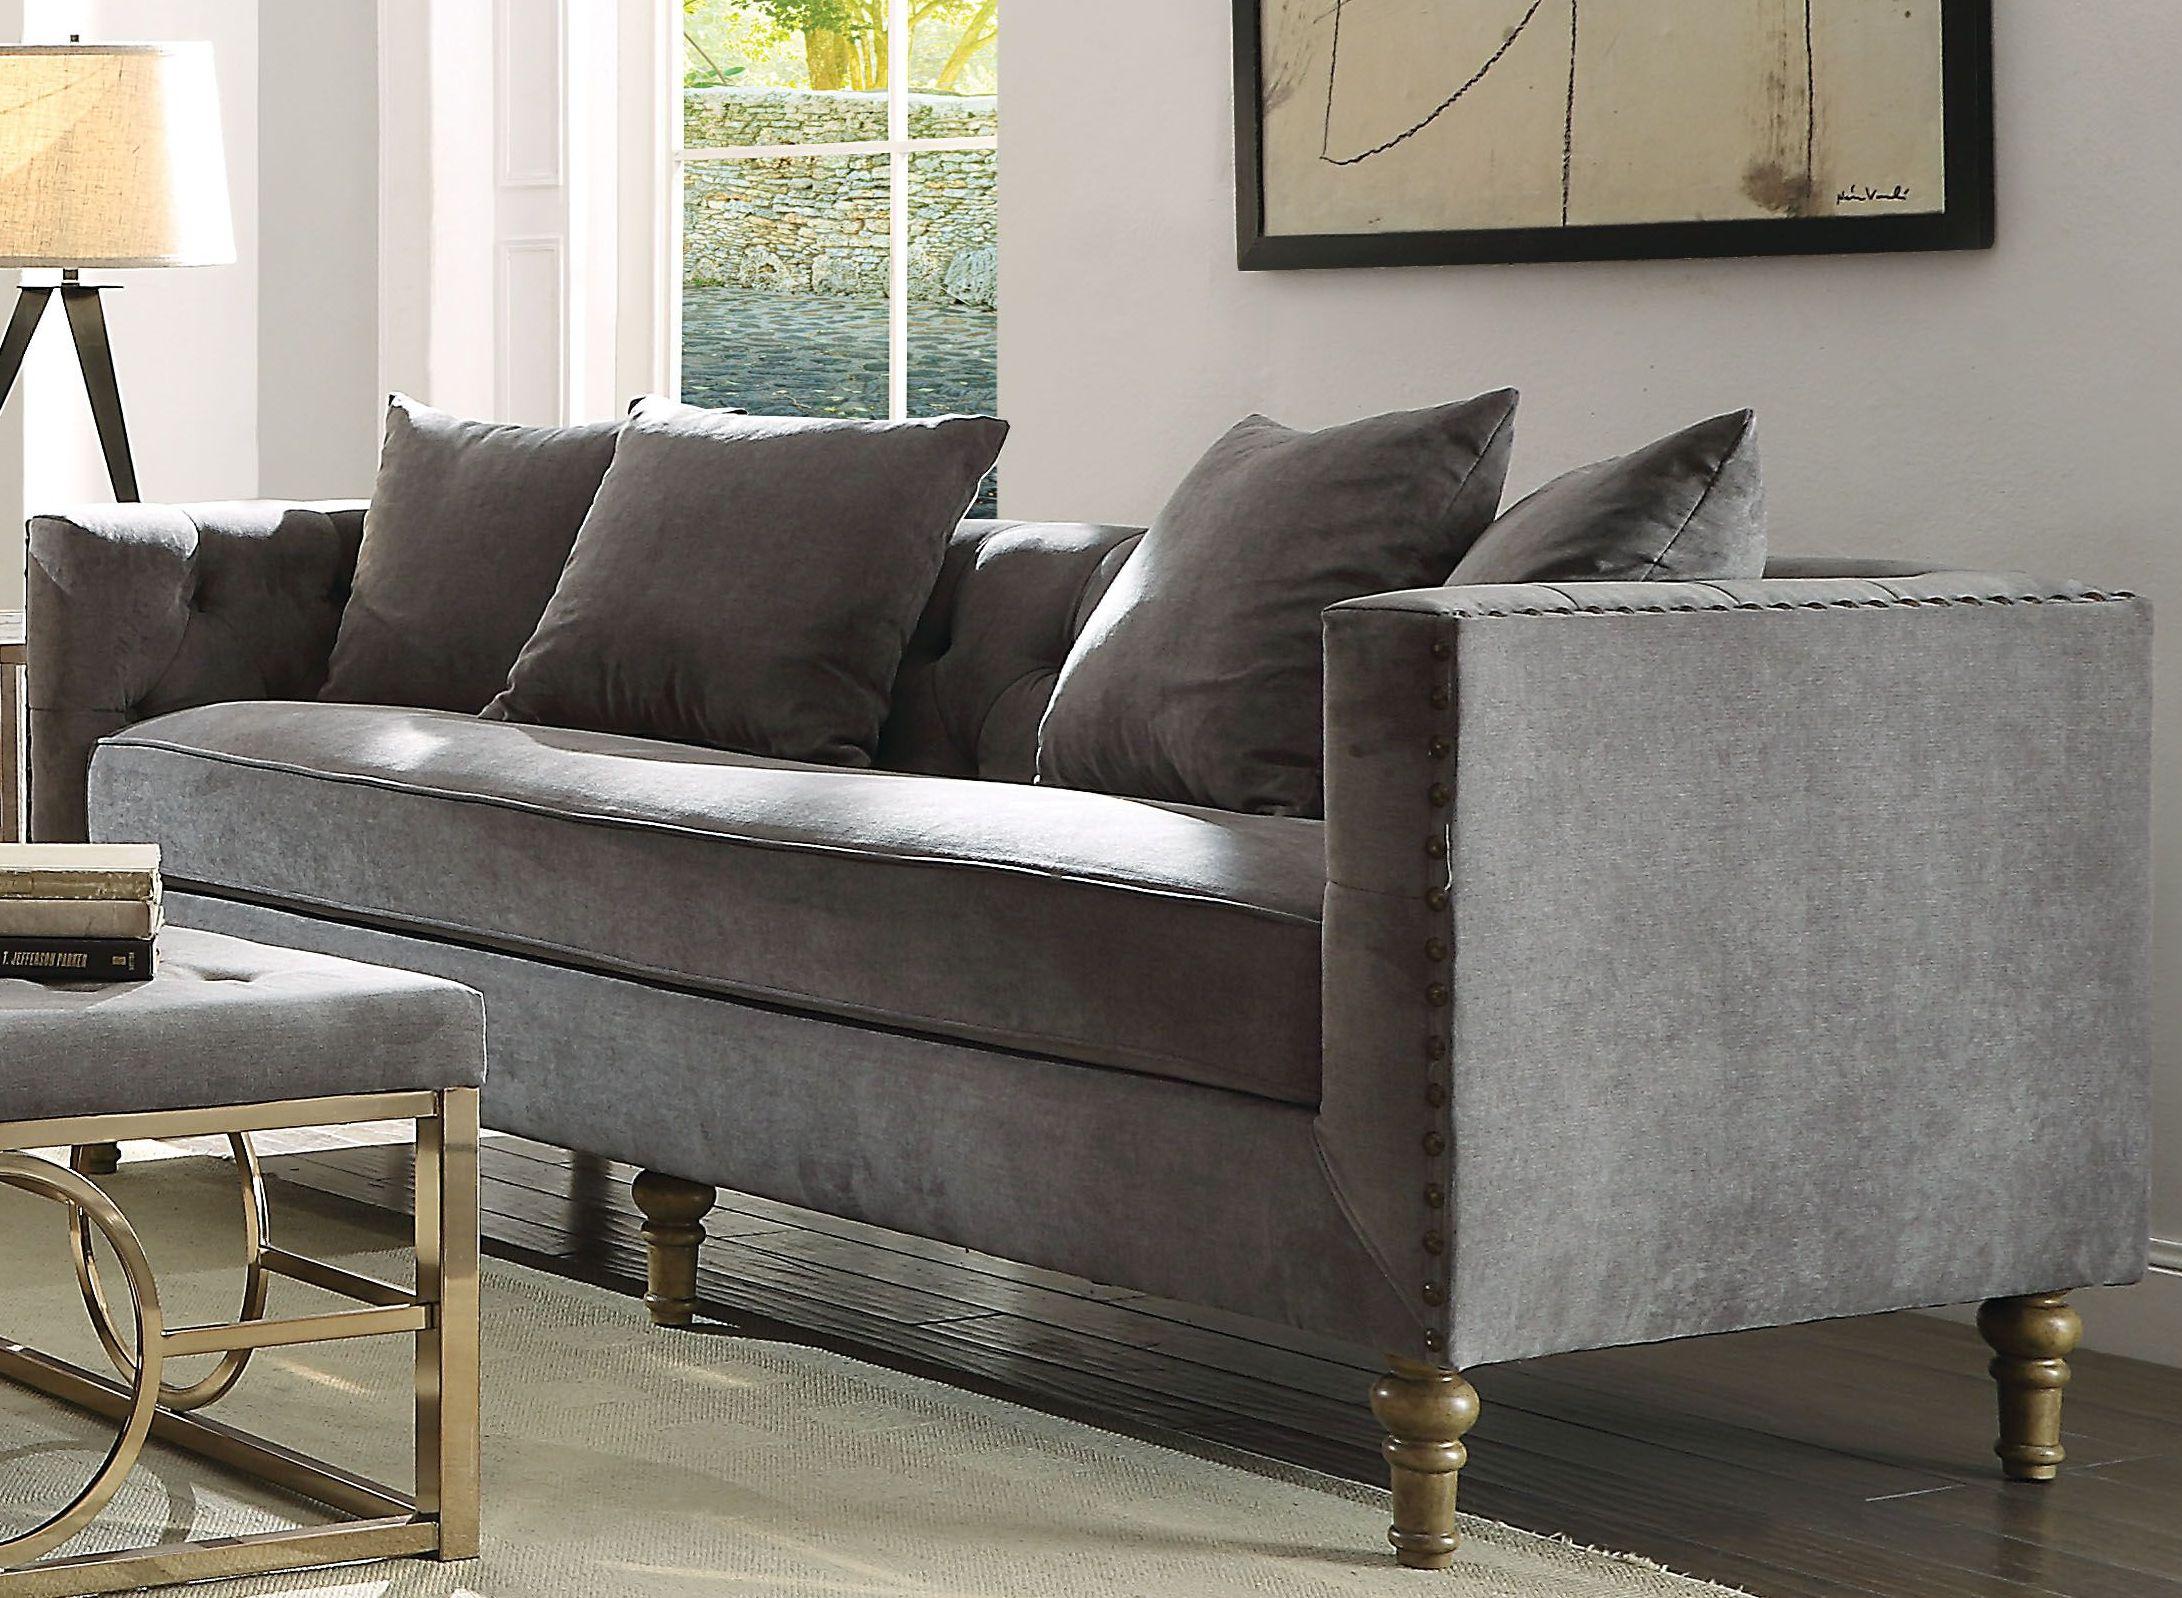 Sidonia gray velvet sofamedia image